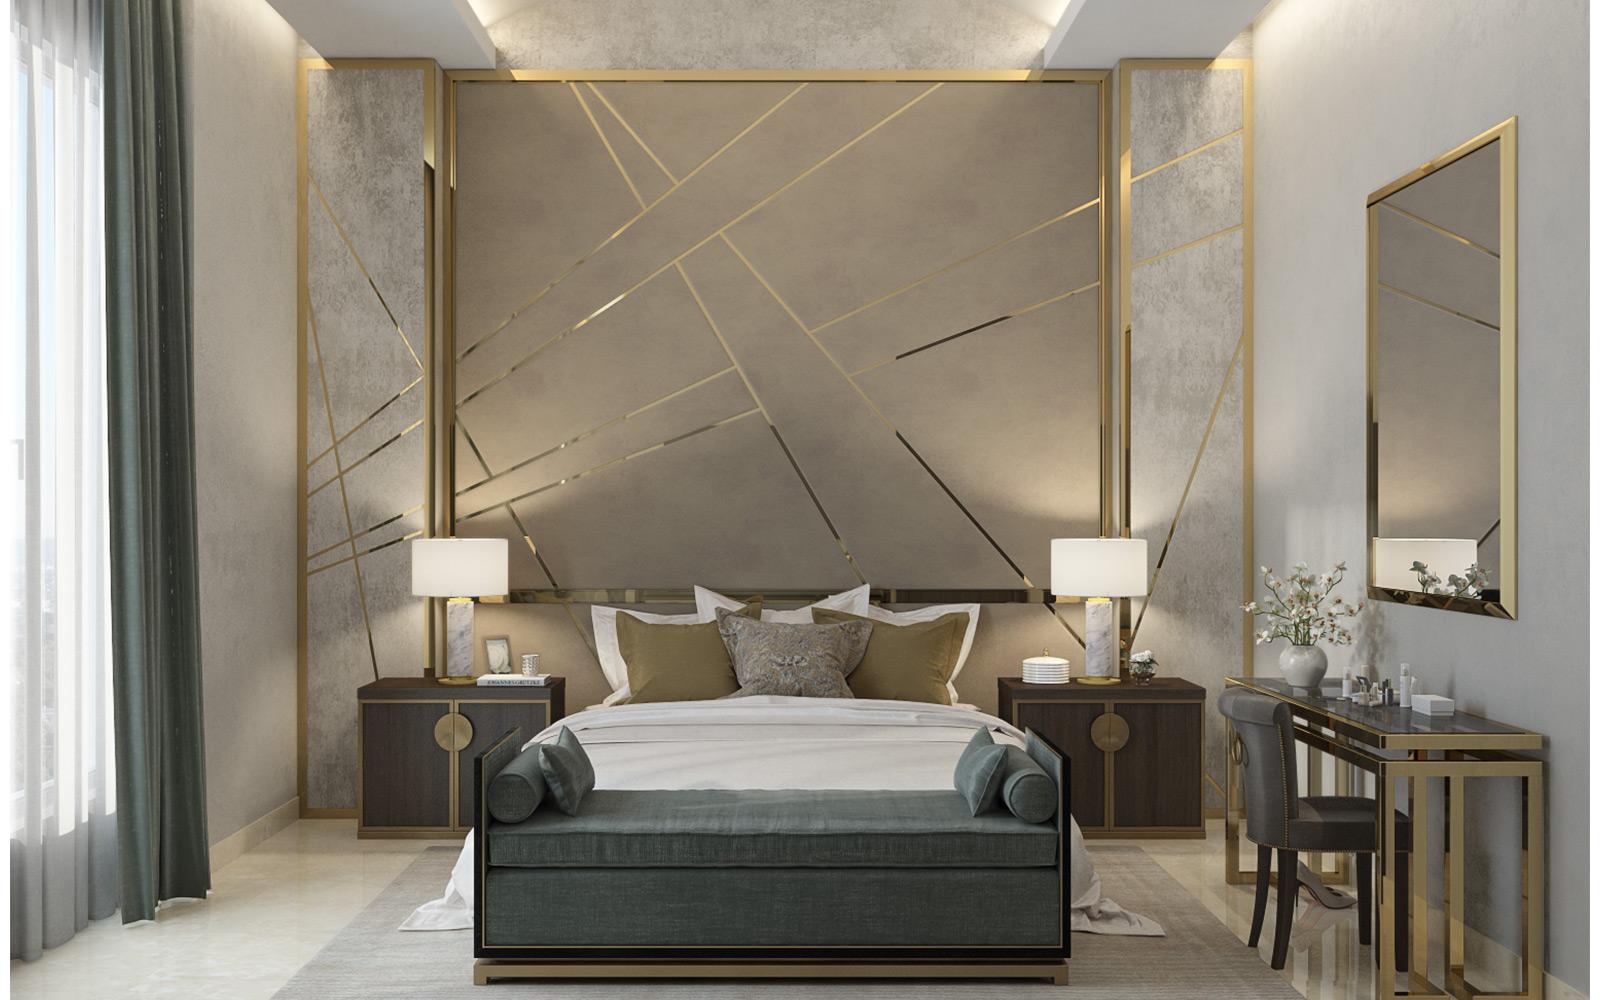 Vogue Design - Jeddah Villa4